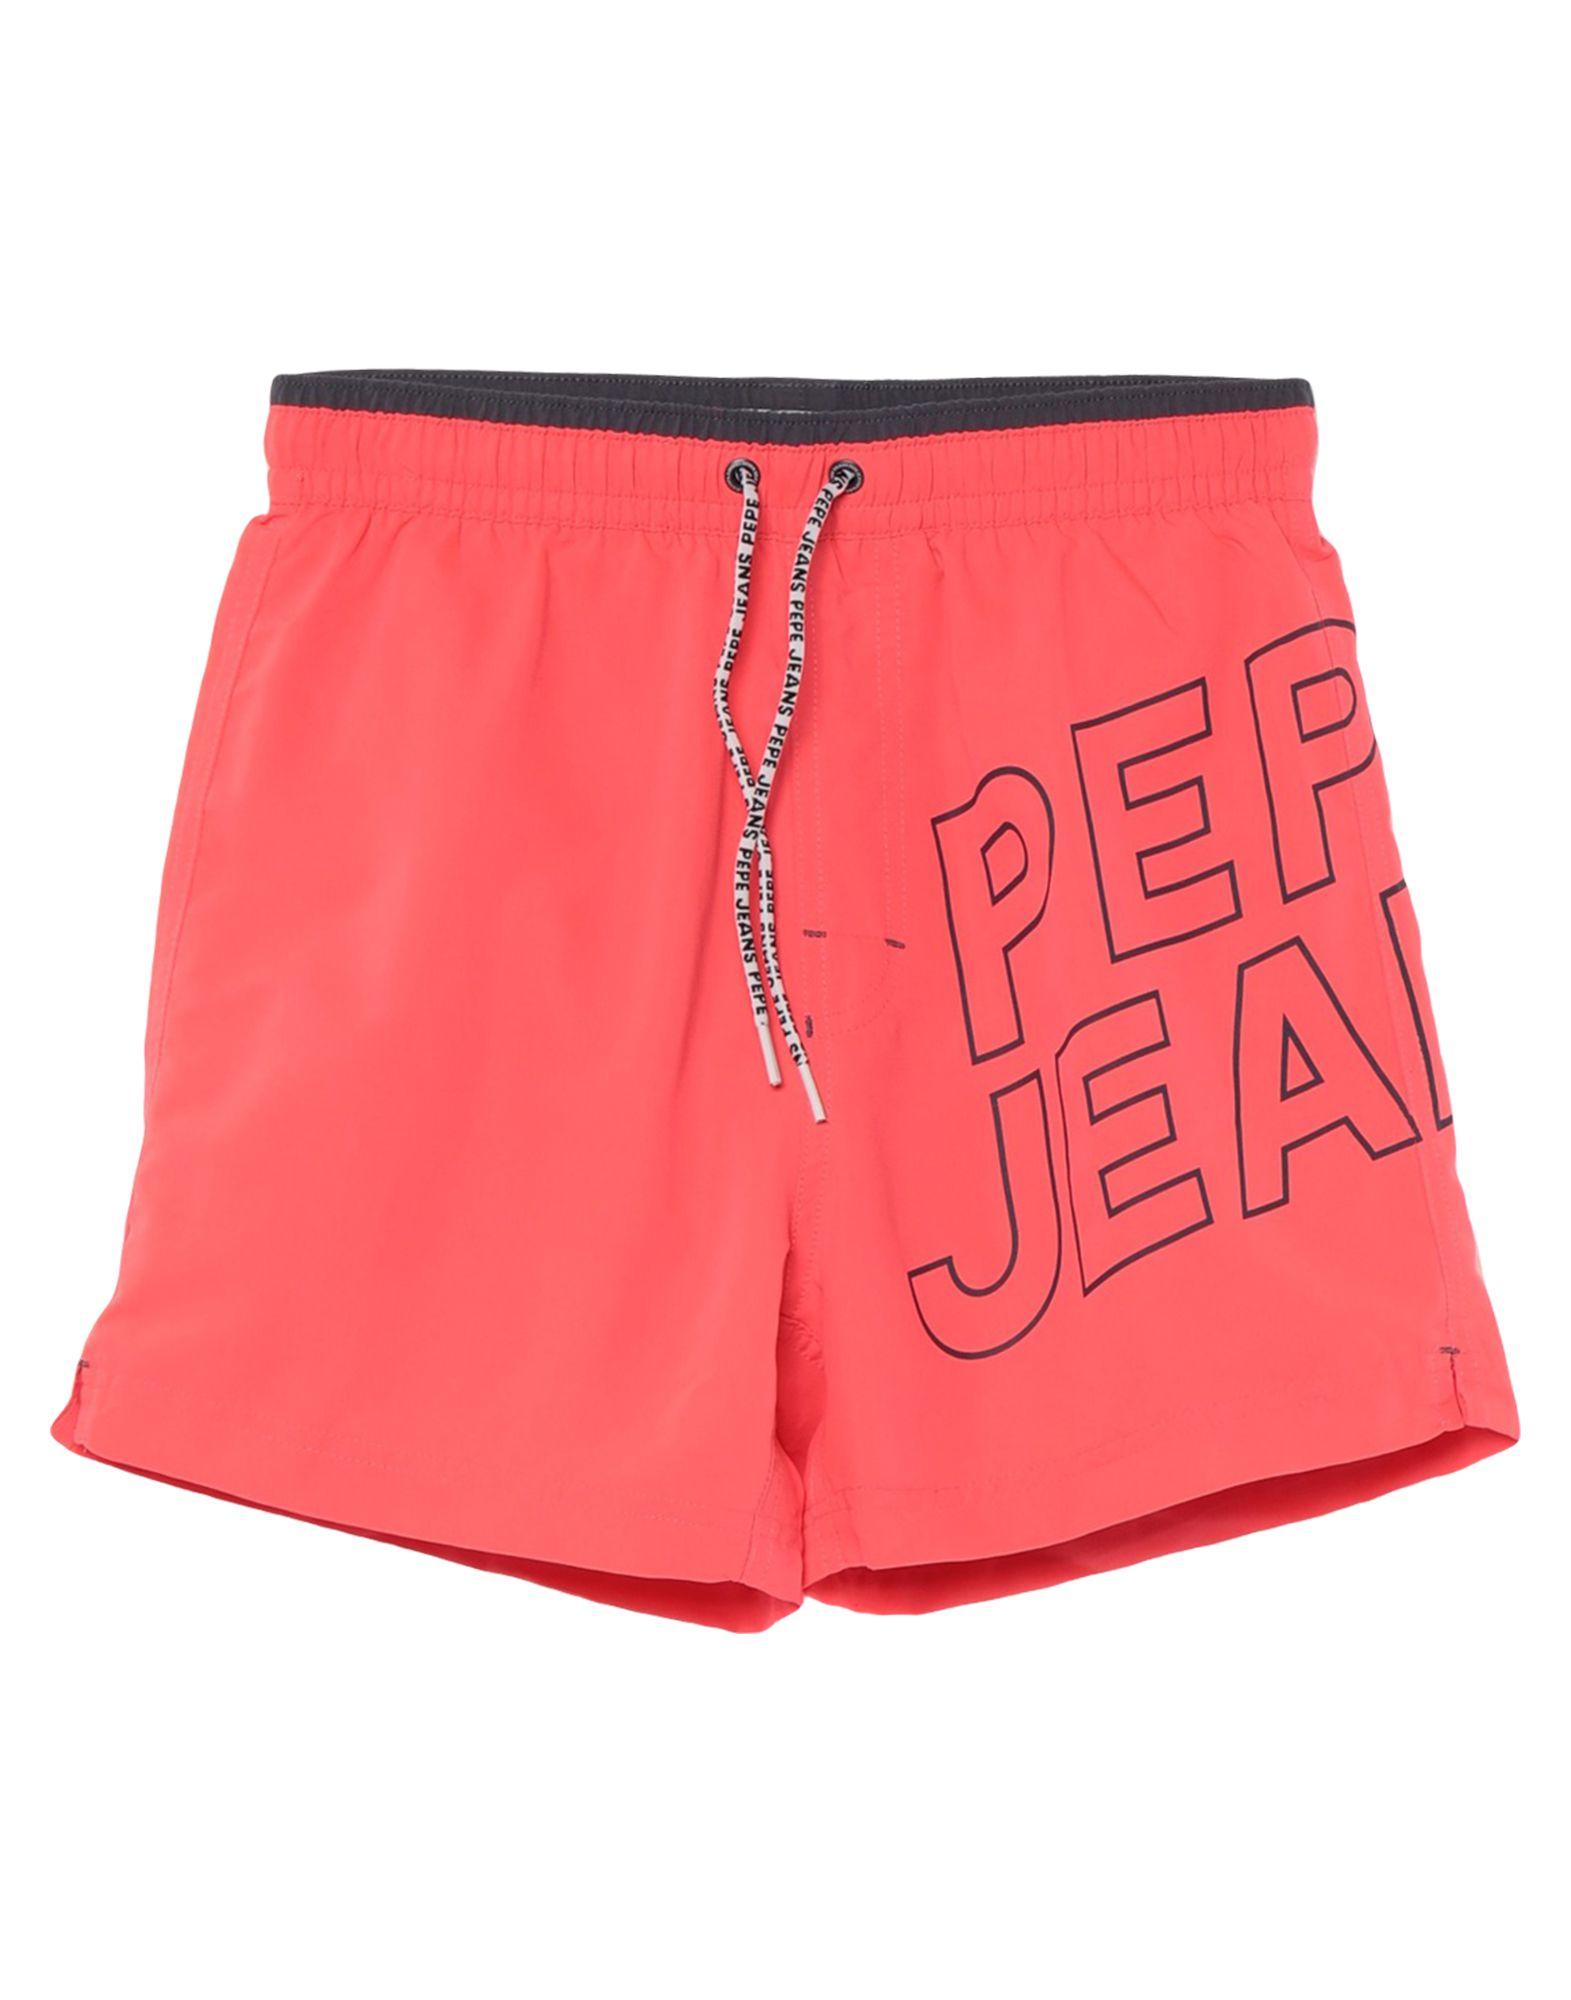 PEPE JEANS Swim trunks - Item 47262233